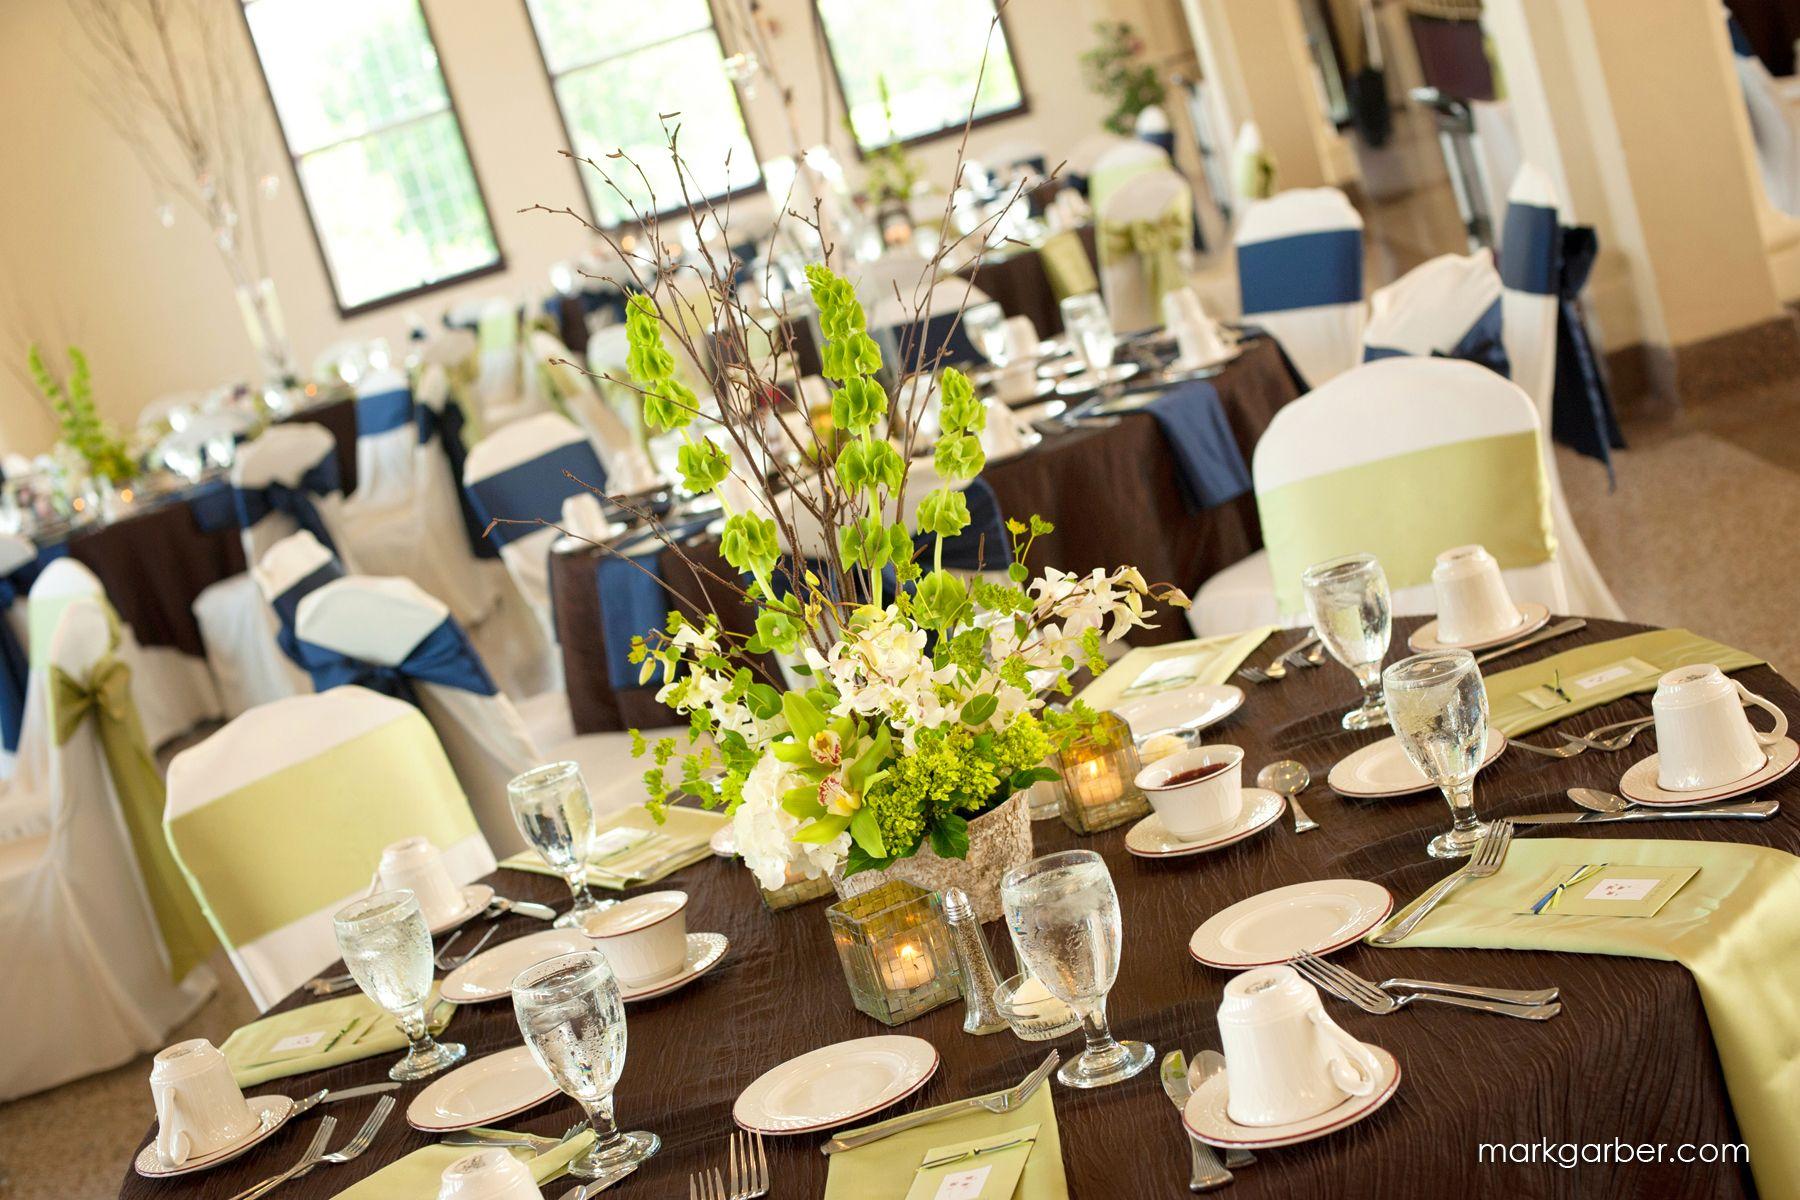 Schindler Banquet Center Xenia Ohio Www Primetimepartyrental Com Dayton Weddings Party Events Rental Event Rental Party Event Party Rentals